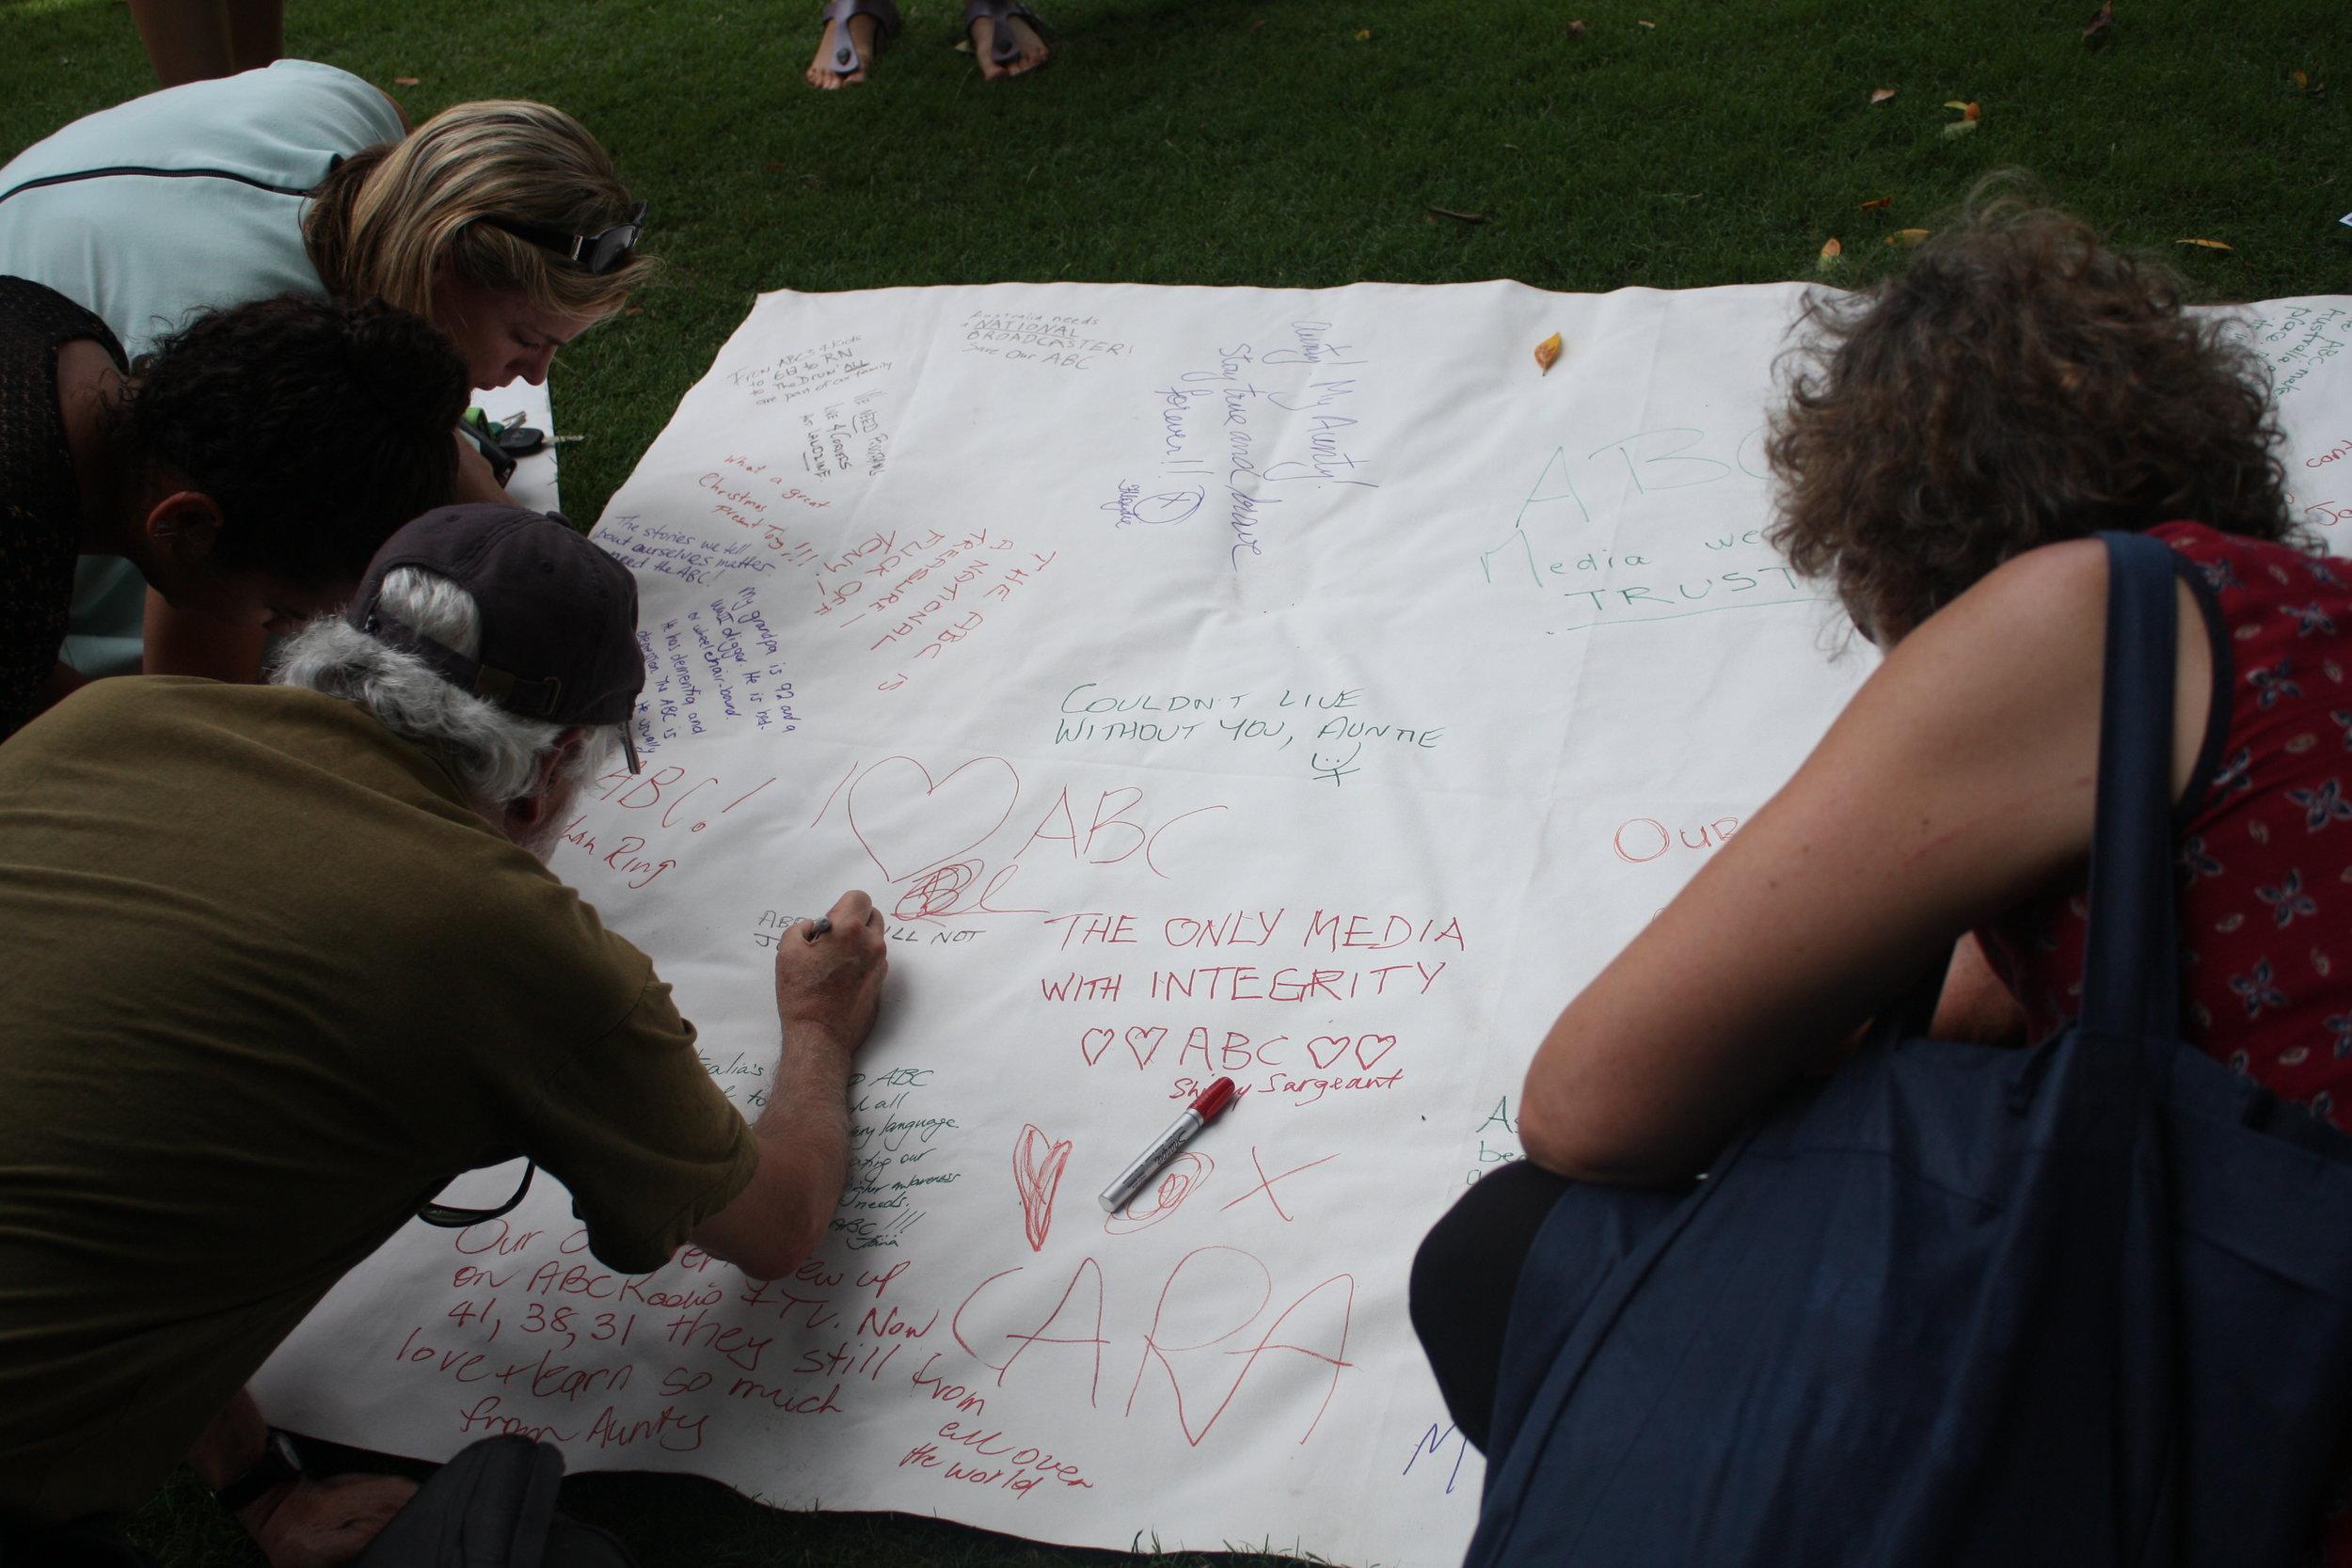 Lesly Lotha_Newzulu Australia_ABC cuts protest_Brisbane 05